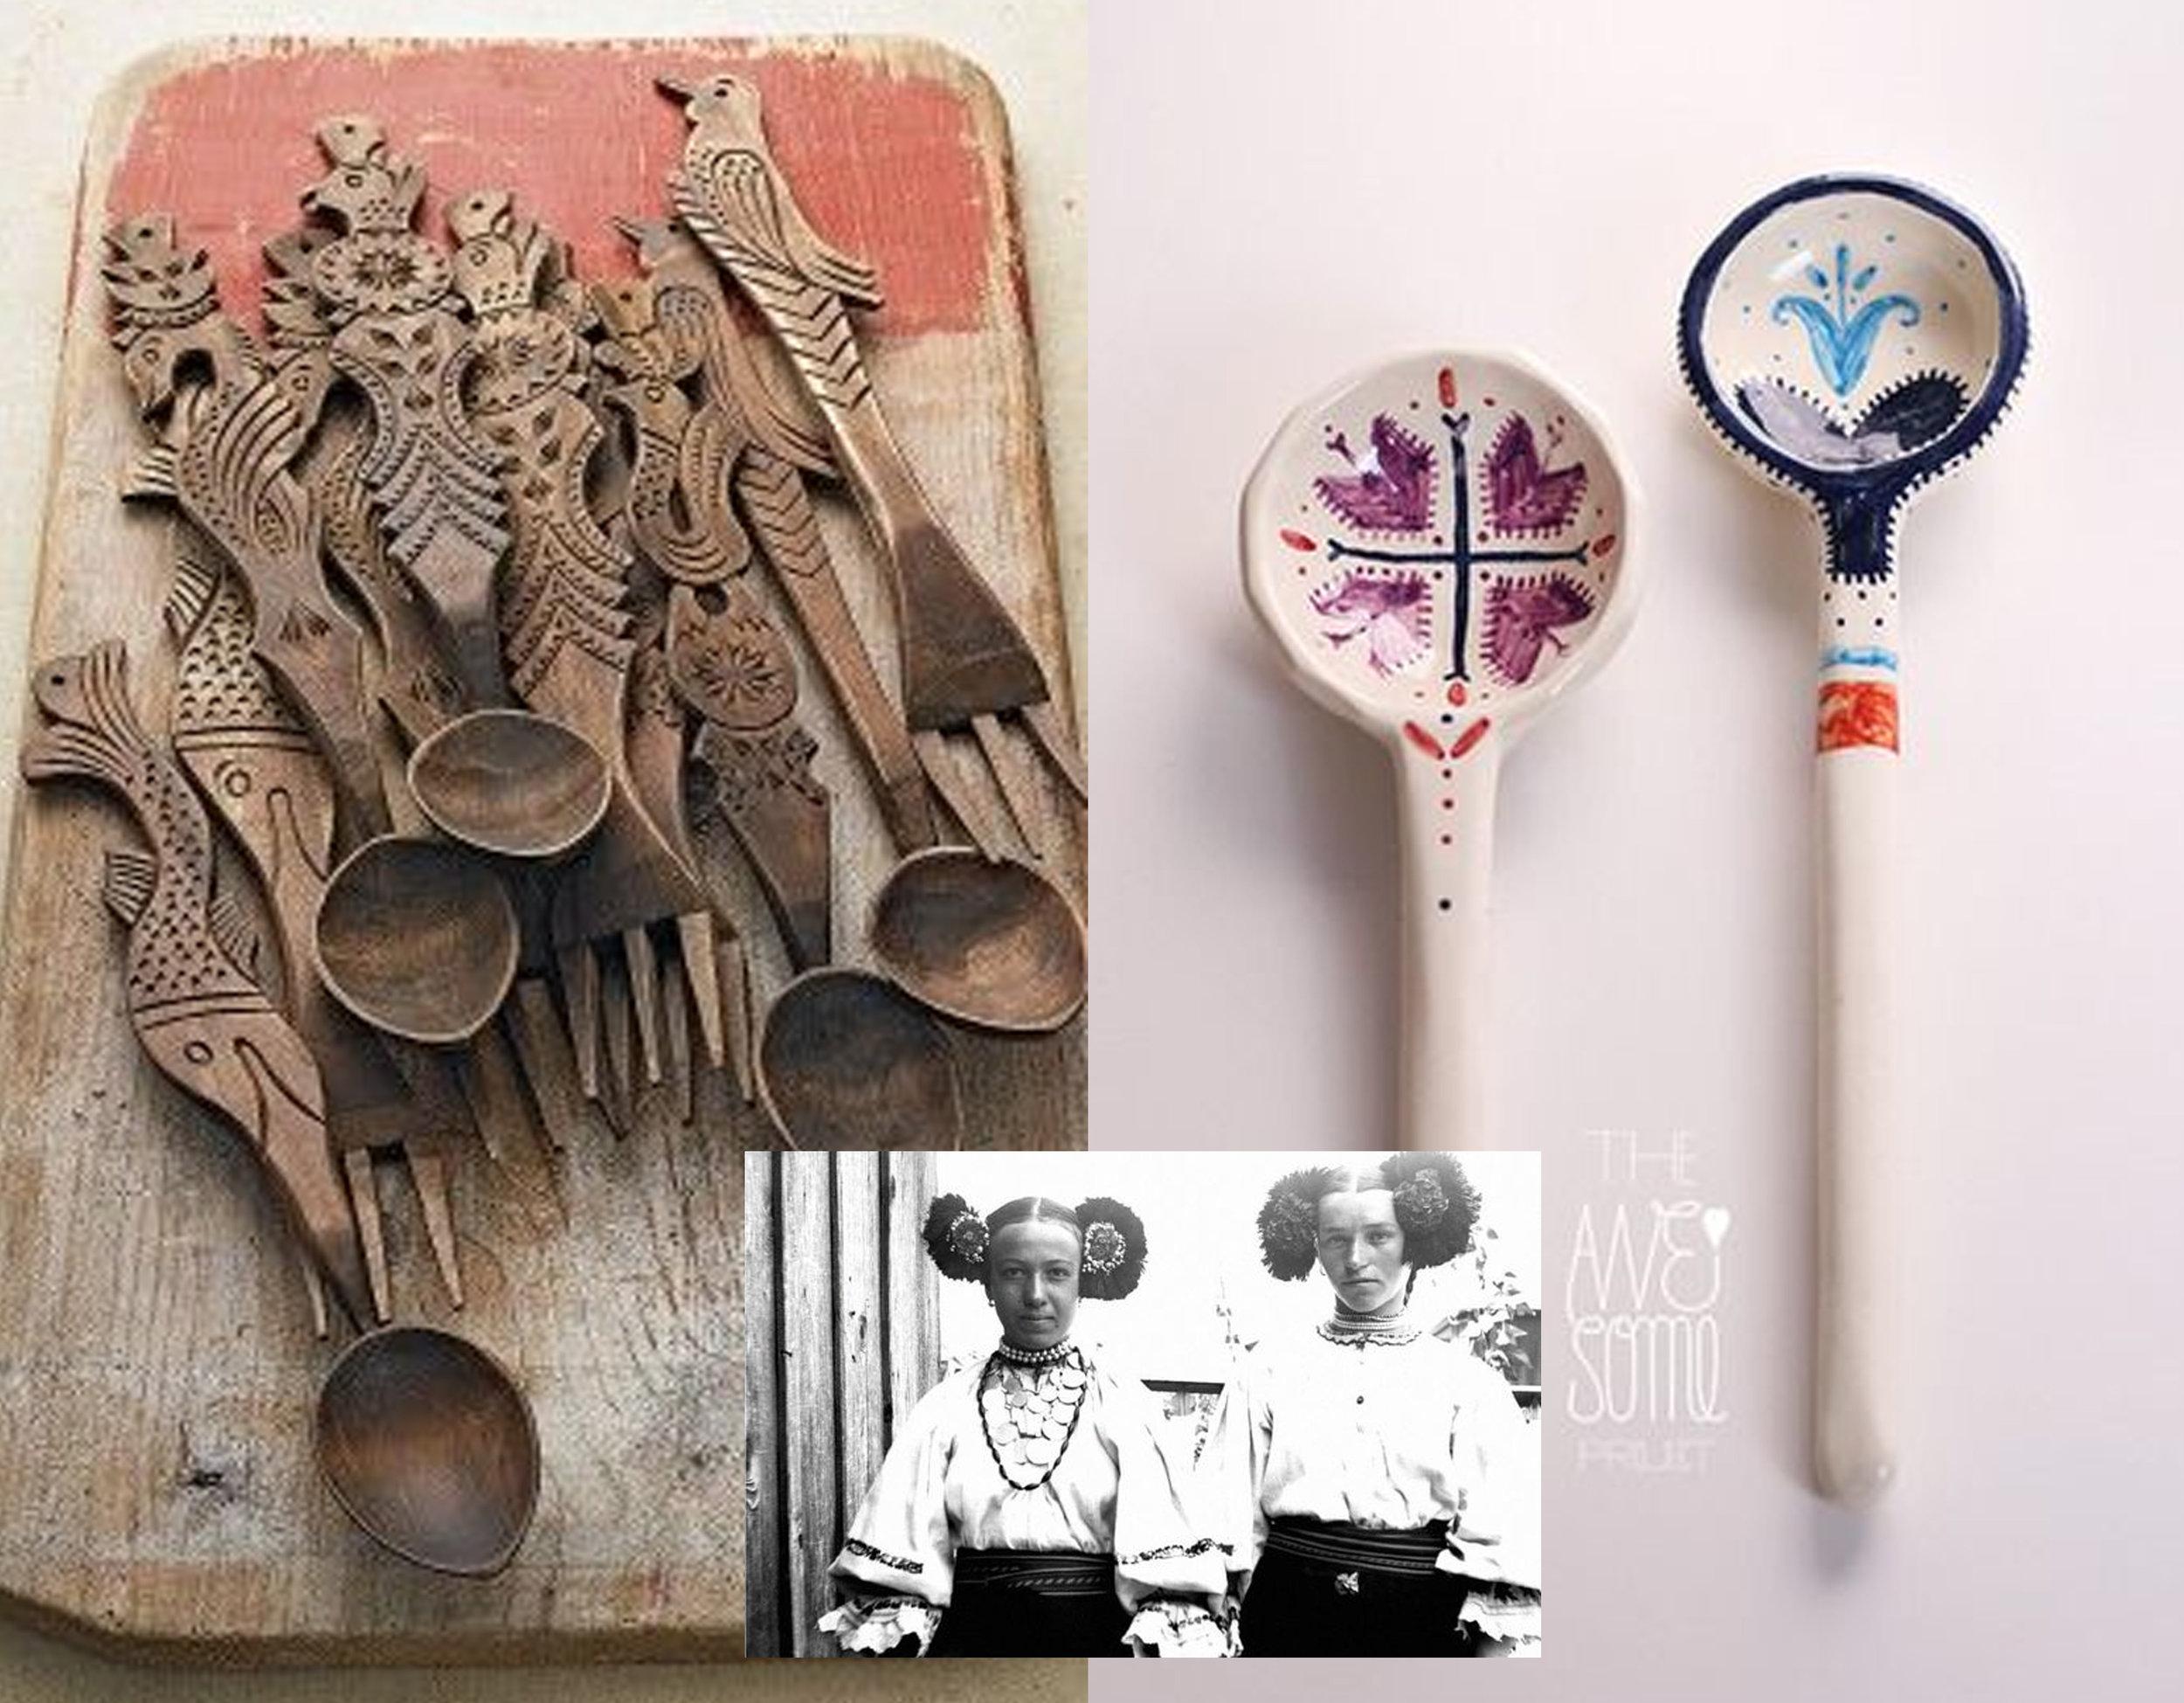 wooden spoons via  Pinterest - ceramic spoons  The Awesome Project  - Romanian women via  Folkwear Society